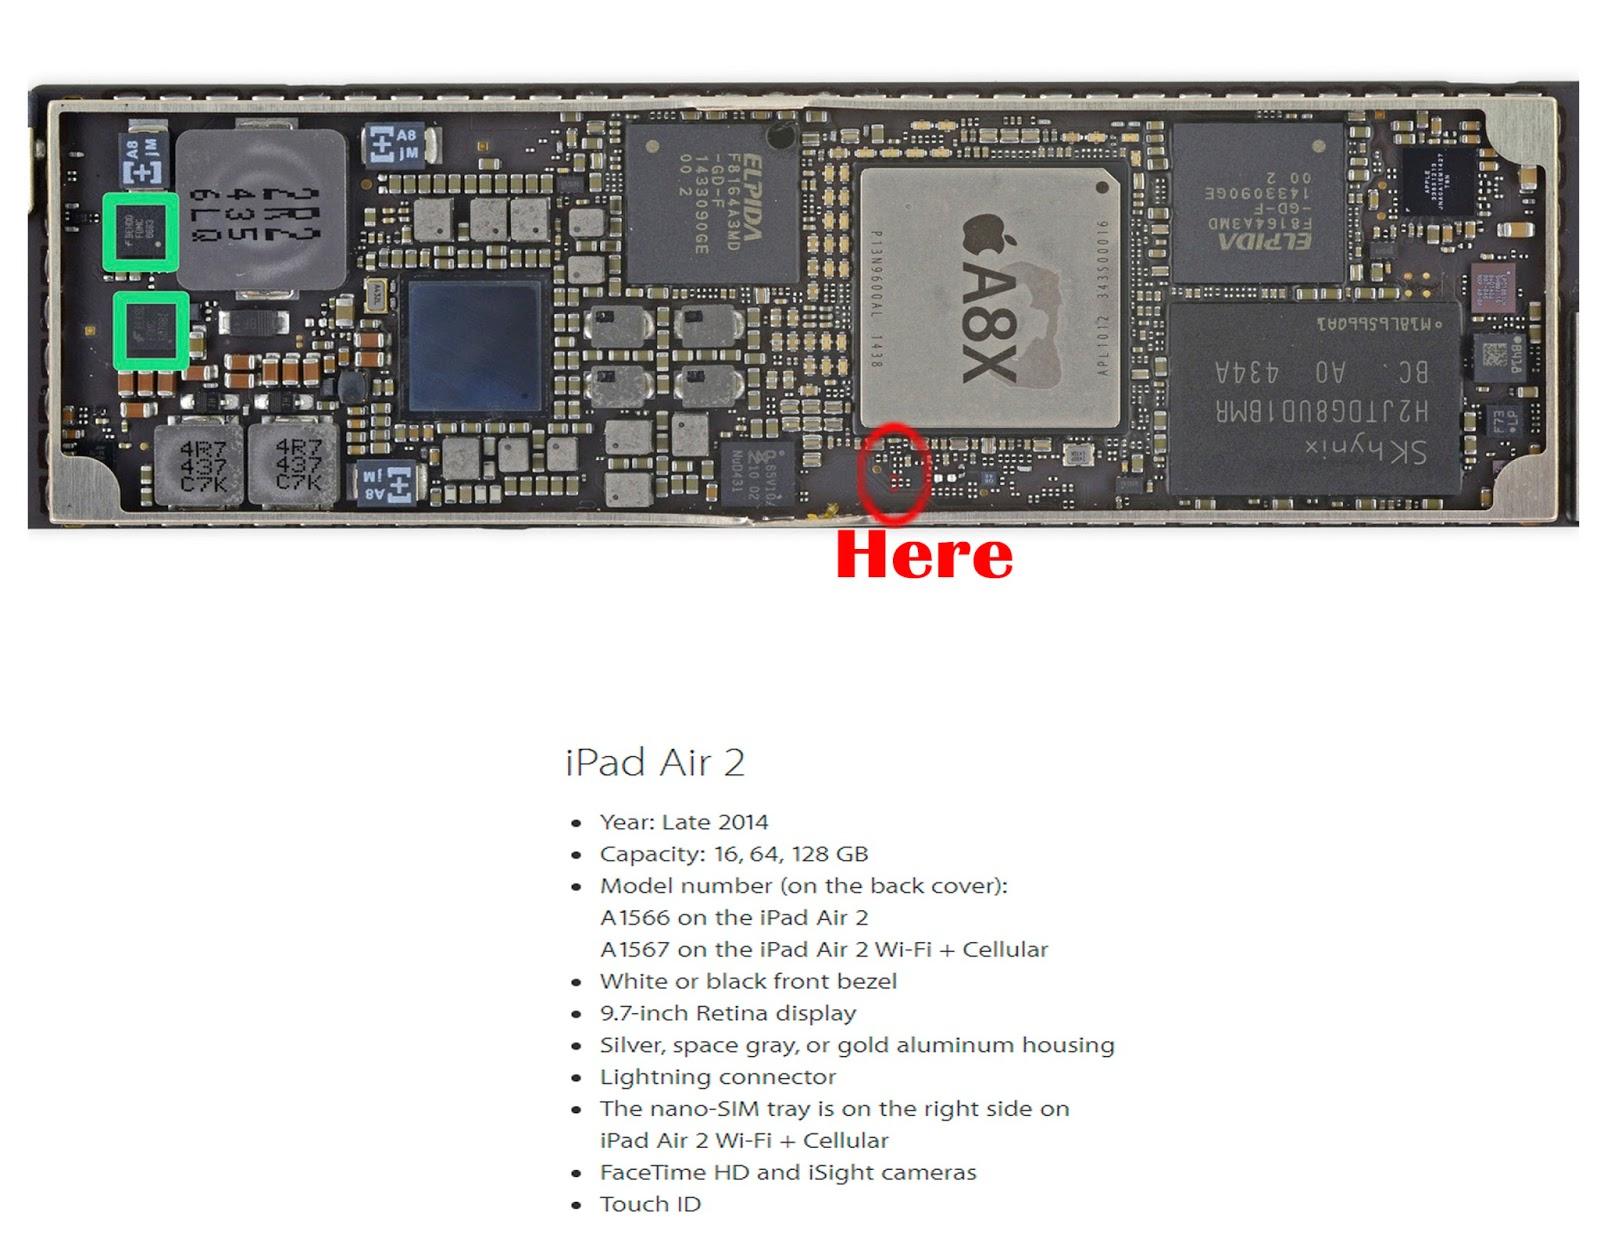 ICloud, remover, pro : Bypass / Remove iCloud, activation Lock Tag: ipad pro - unlock IPad, air and iPad, air 2 - iCloud, unlock hardware method